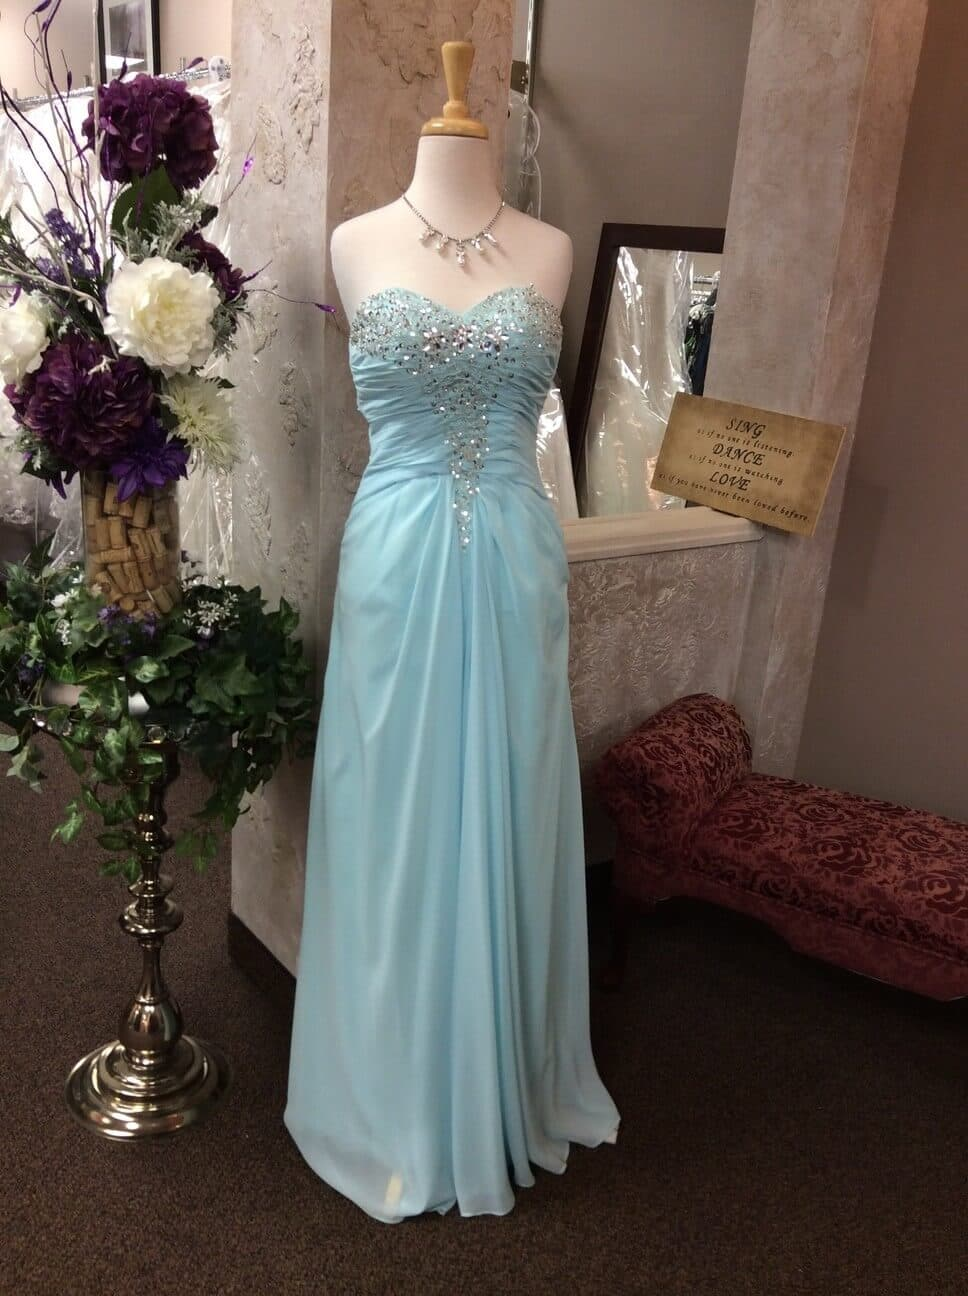 rochester wedding dresses photo - 1